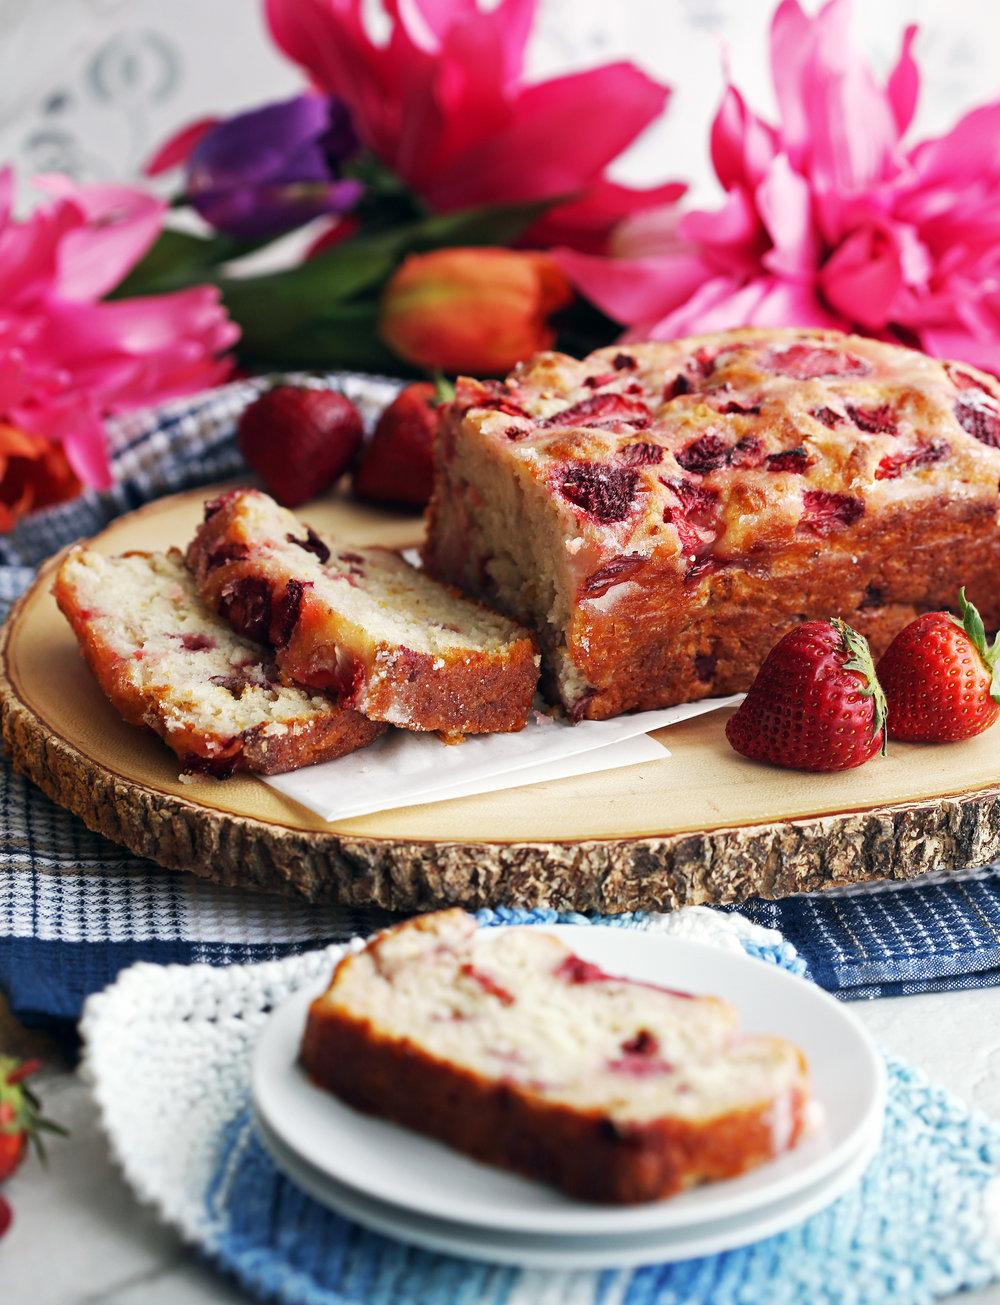 A freshly baked loaf of Strawberry Lemon Yogurt Quick Bread on a large wooden platter.